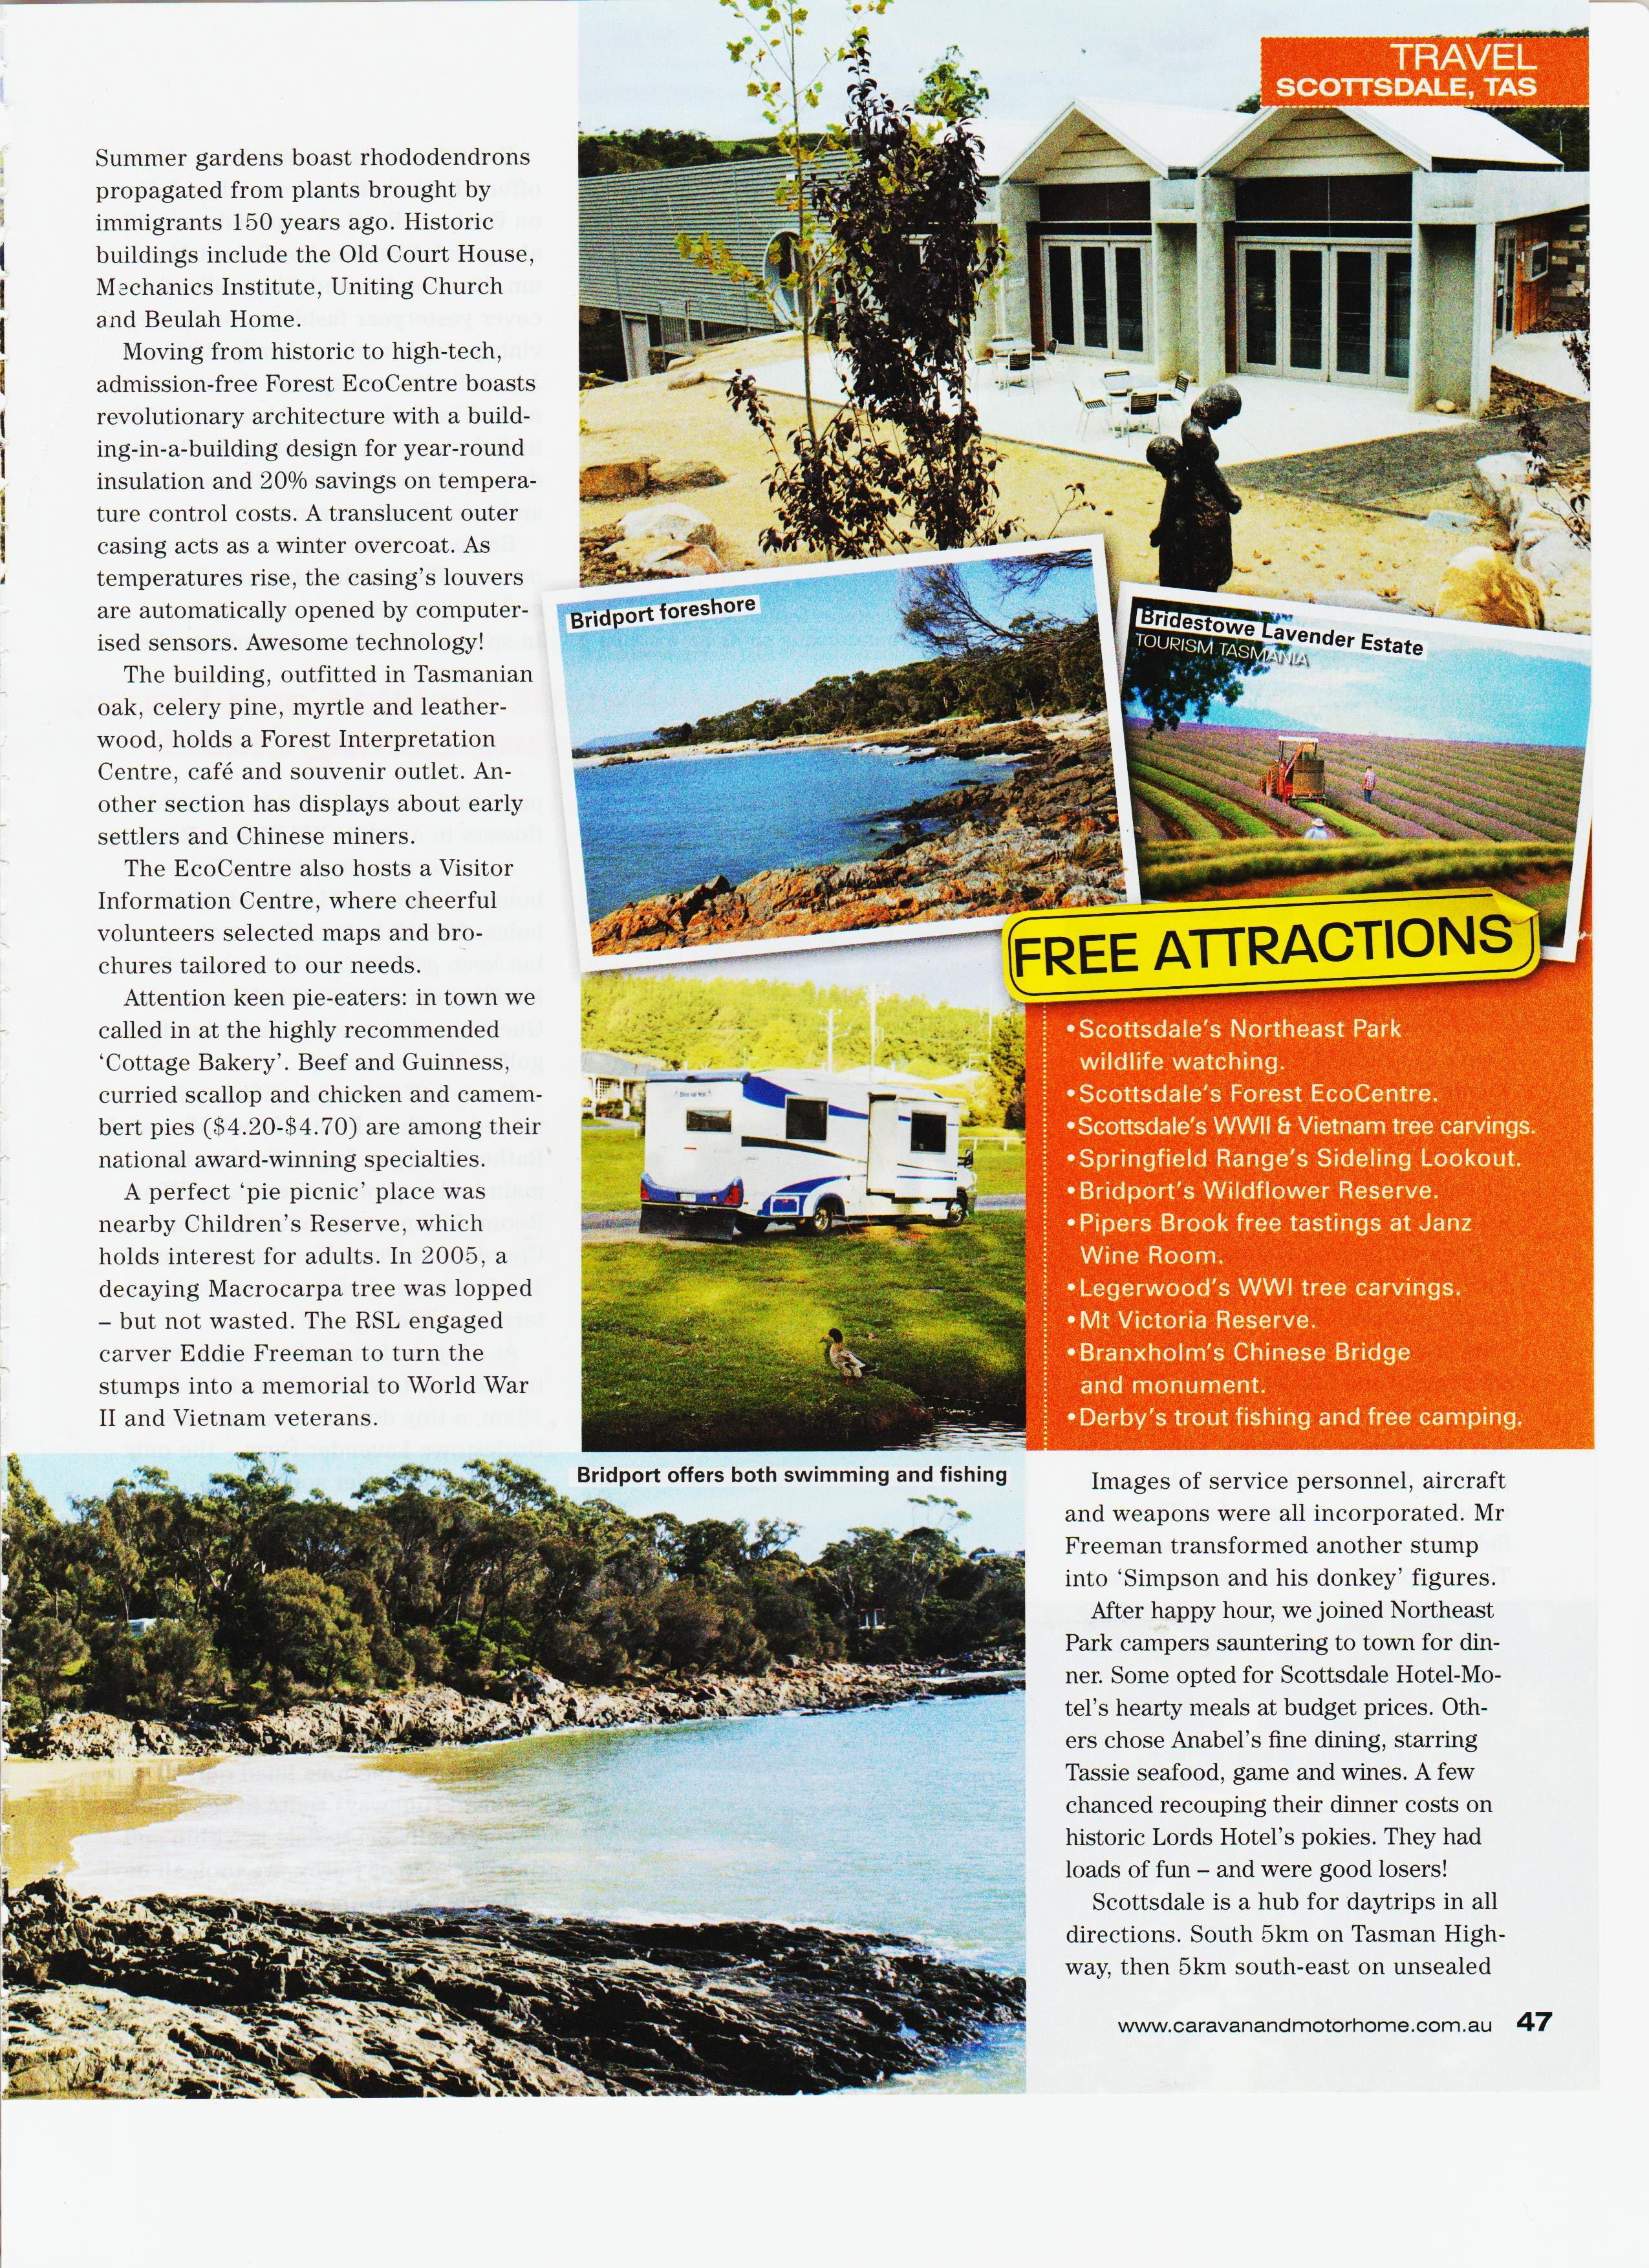 TASMANIA – Memoirs and Travels of Gordon and Pam